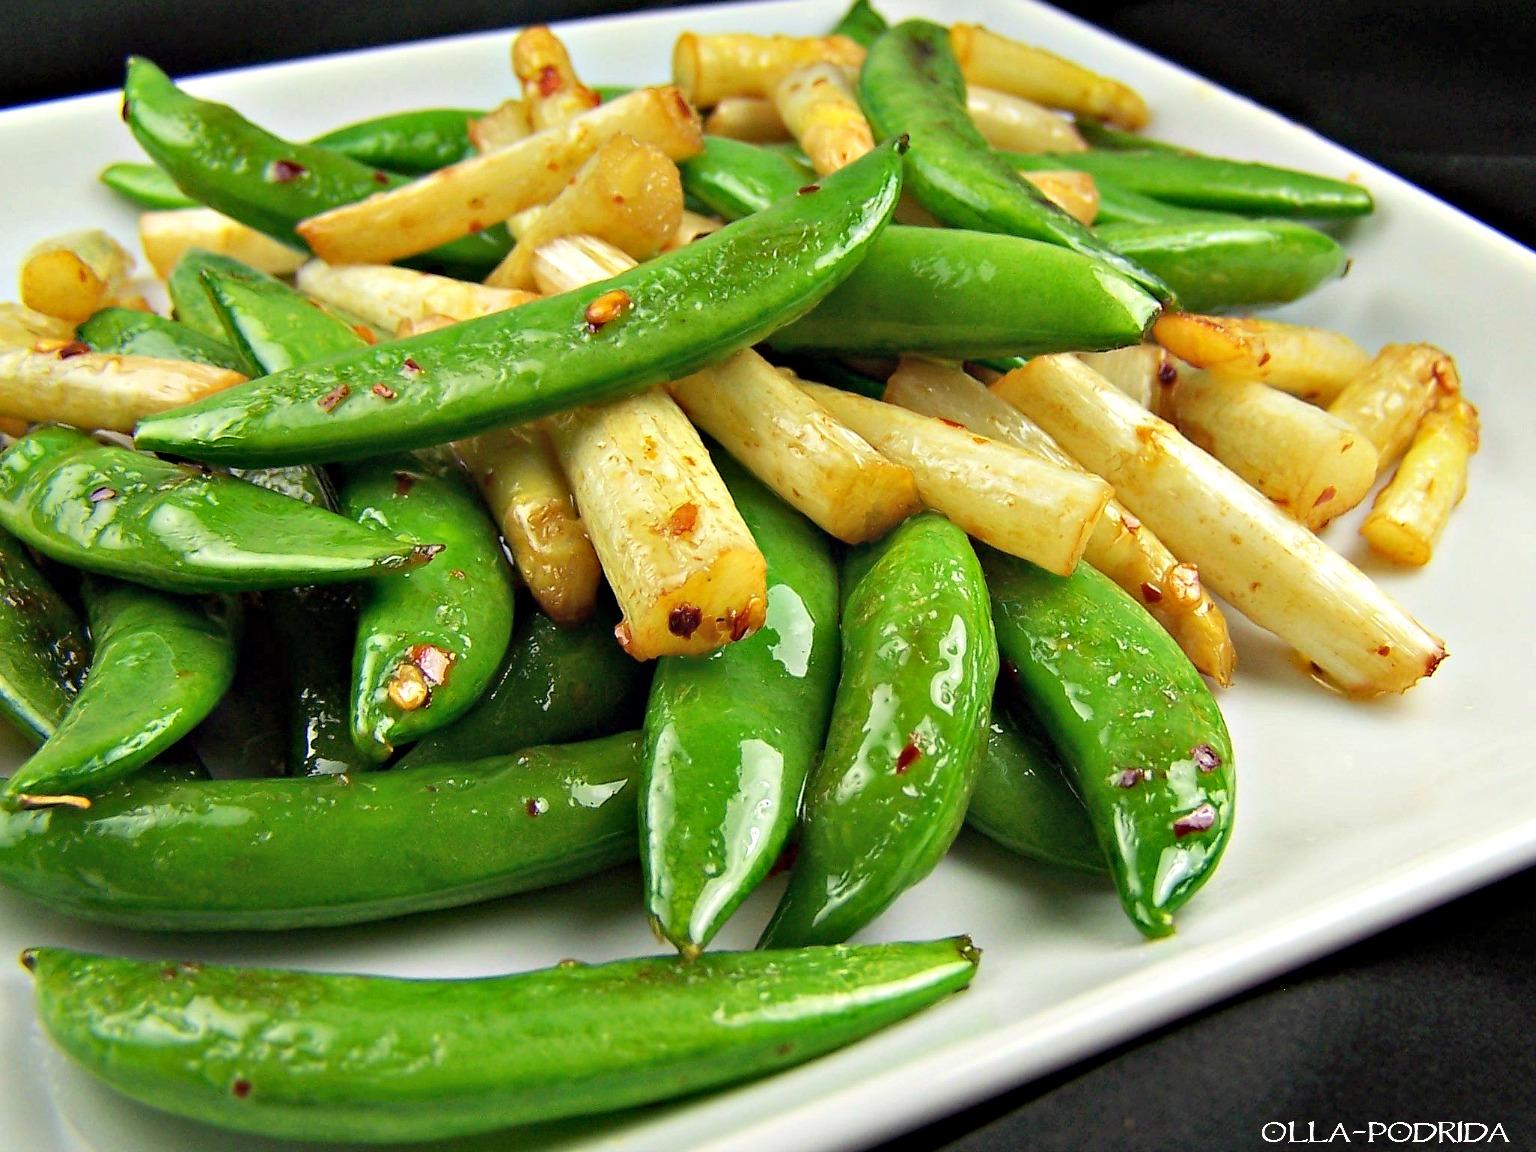 Ina Garten's Sautéed Asparagusand Snap Peas